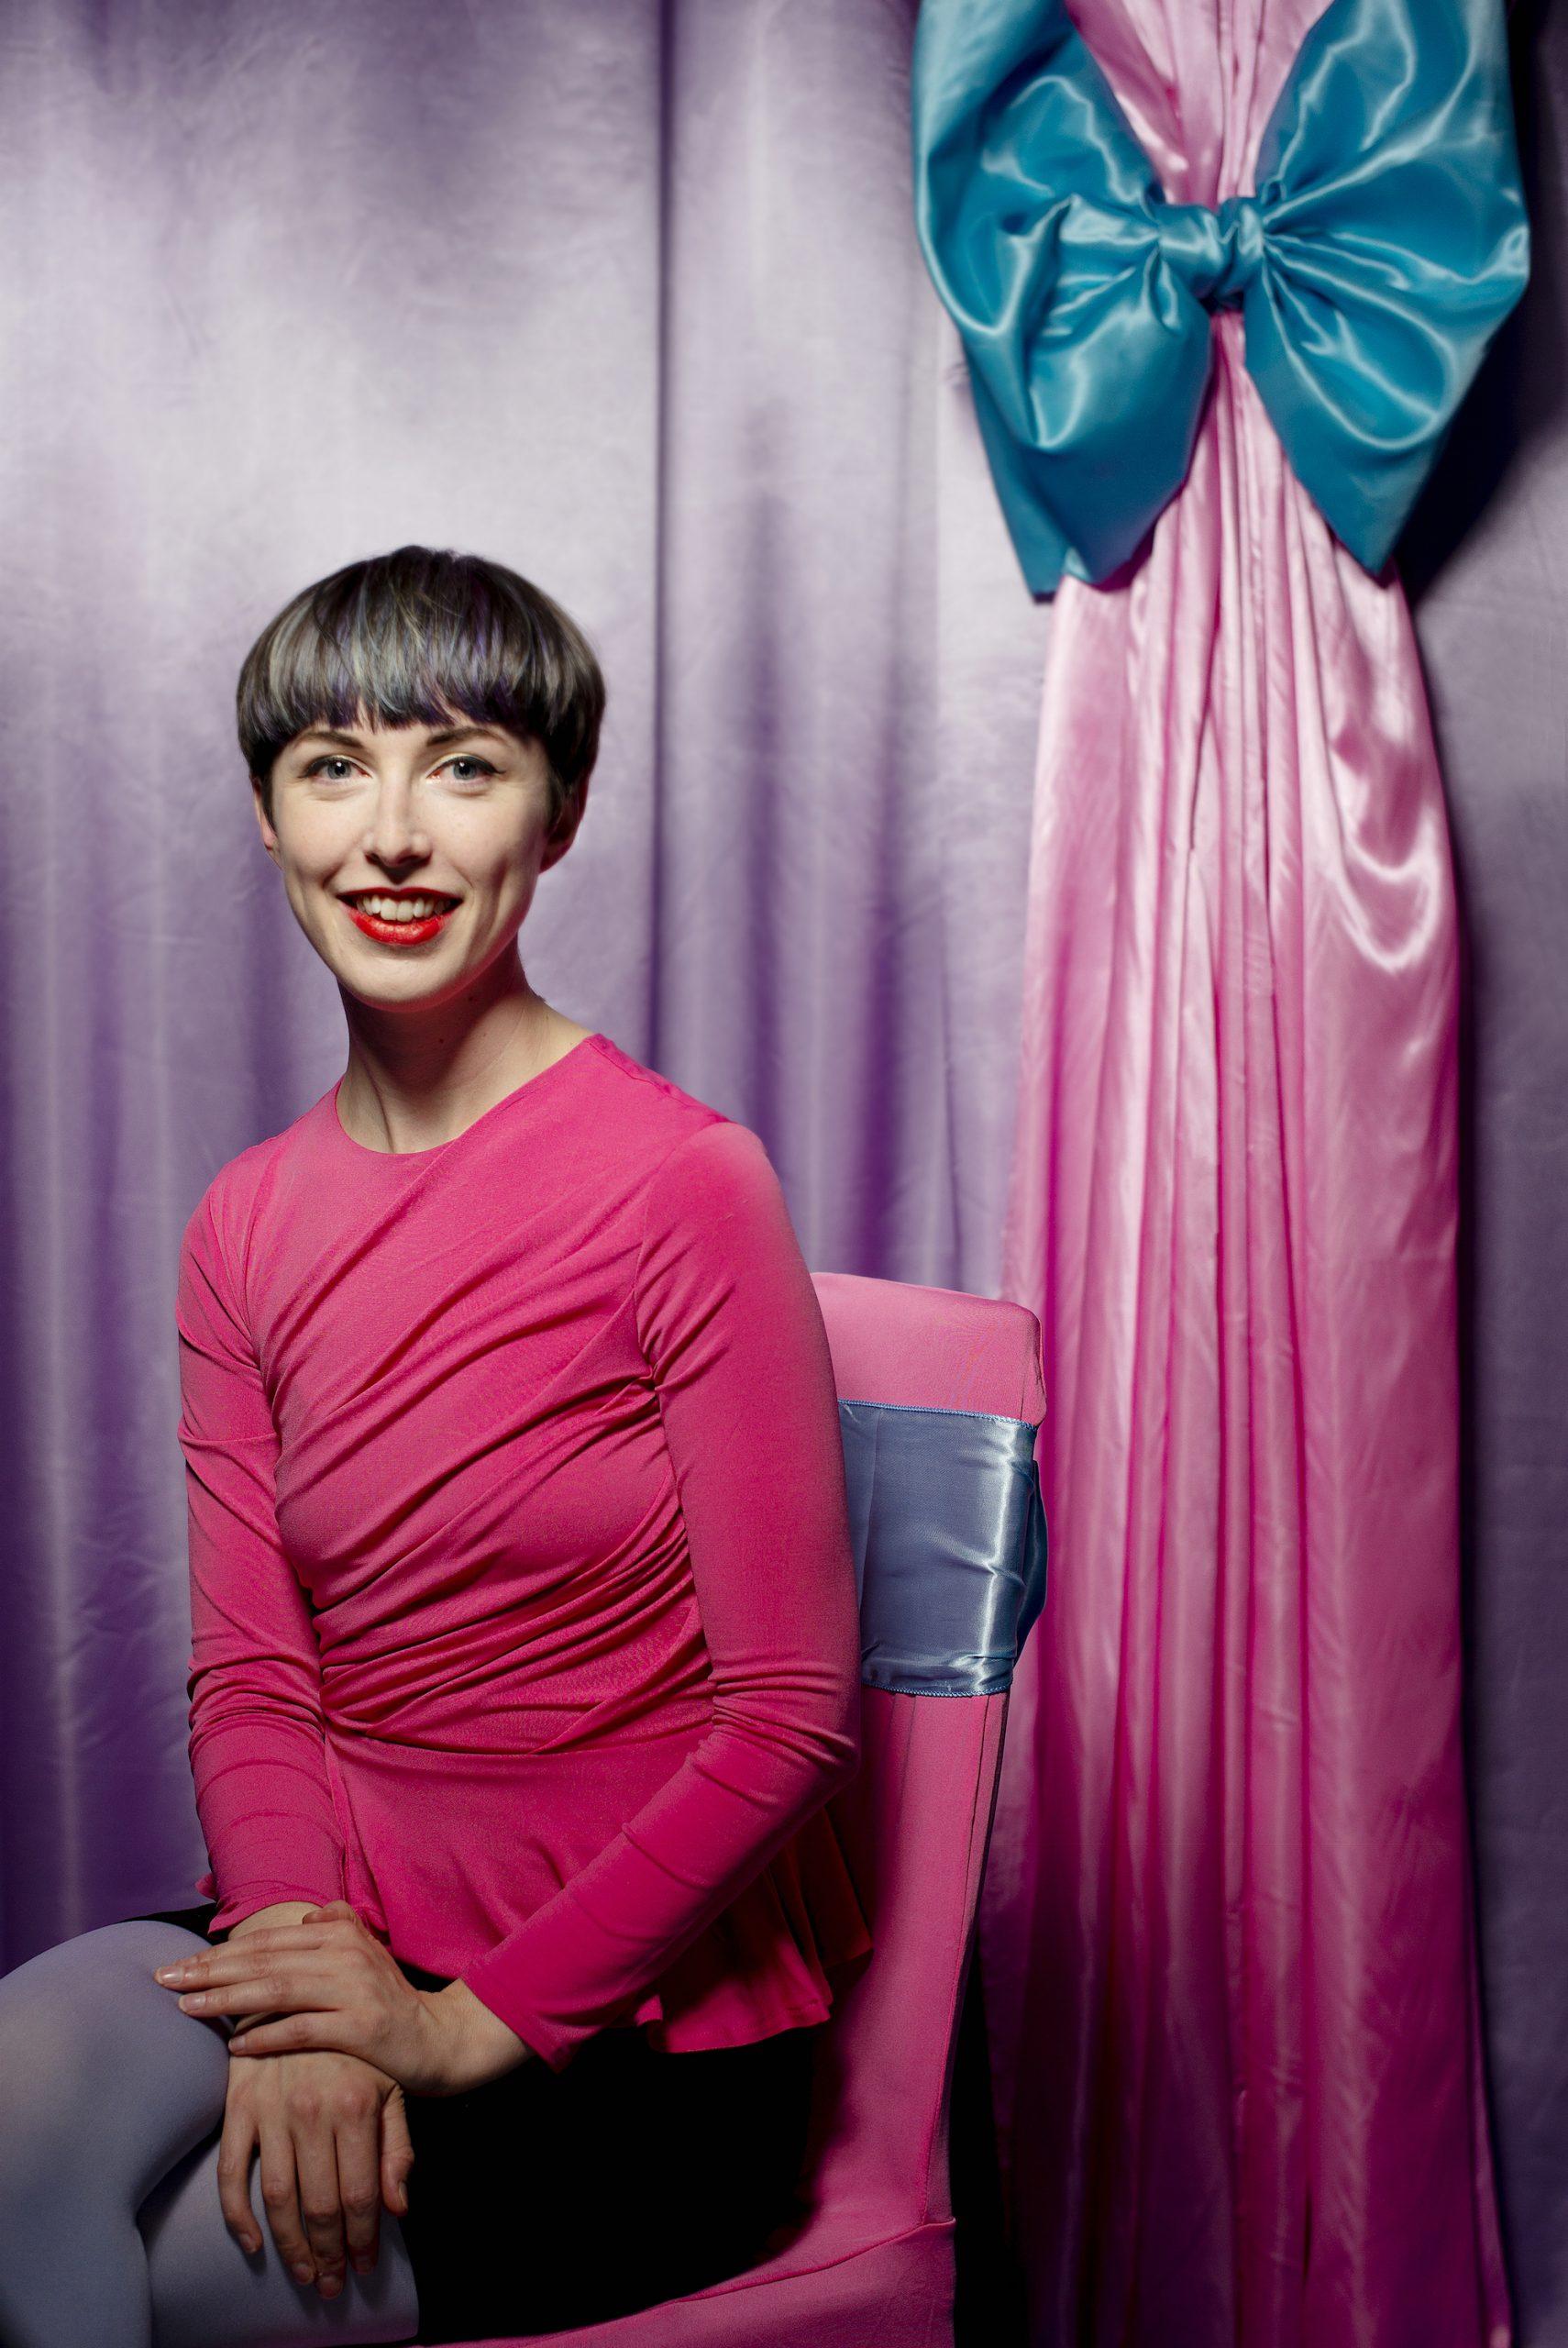 Rachel Maclean at the Zabludowicz collection, London. Photo © David Bebber